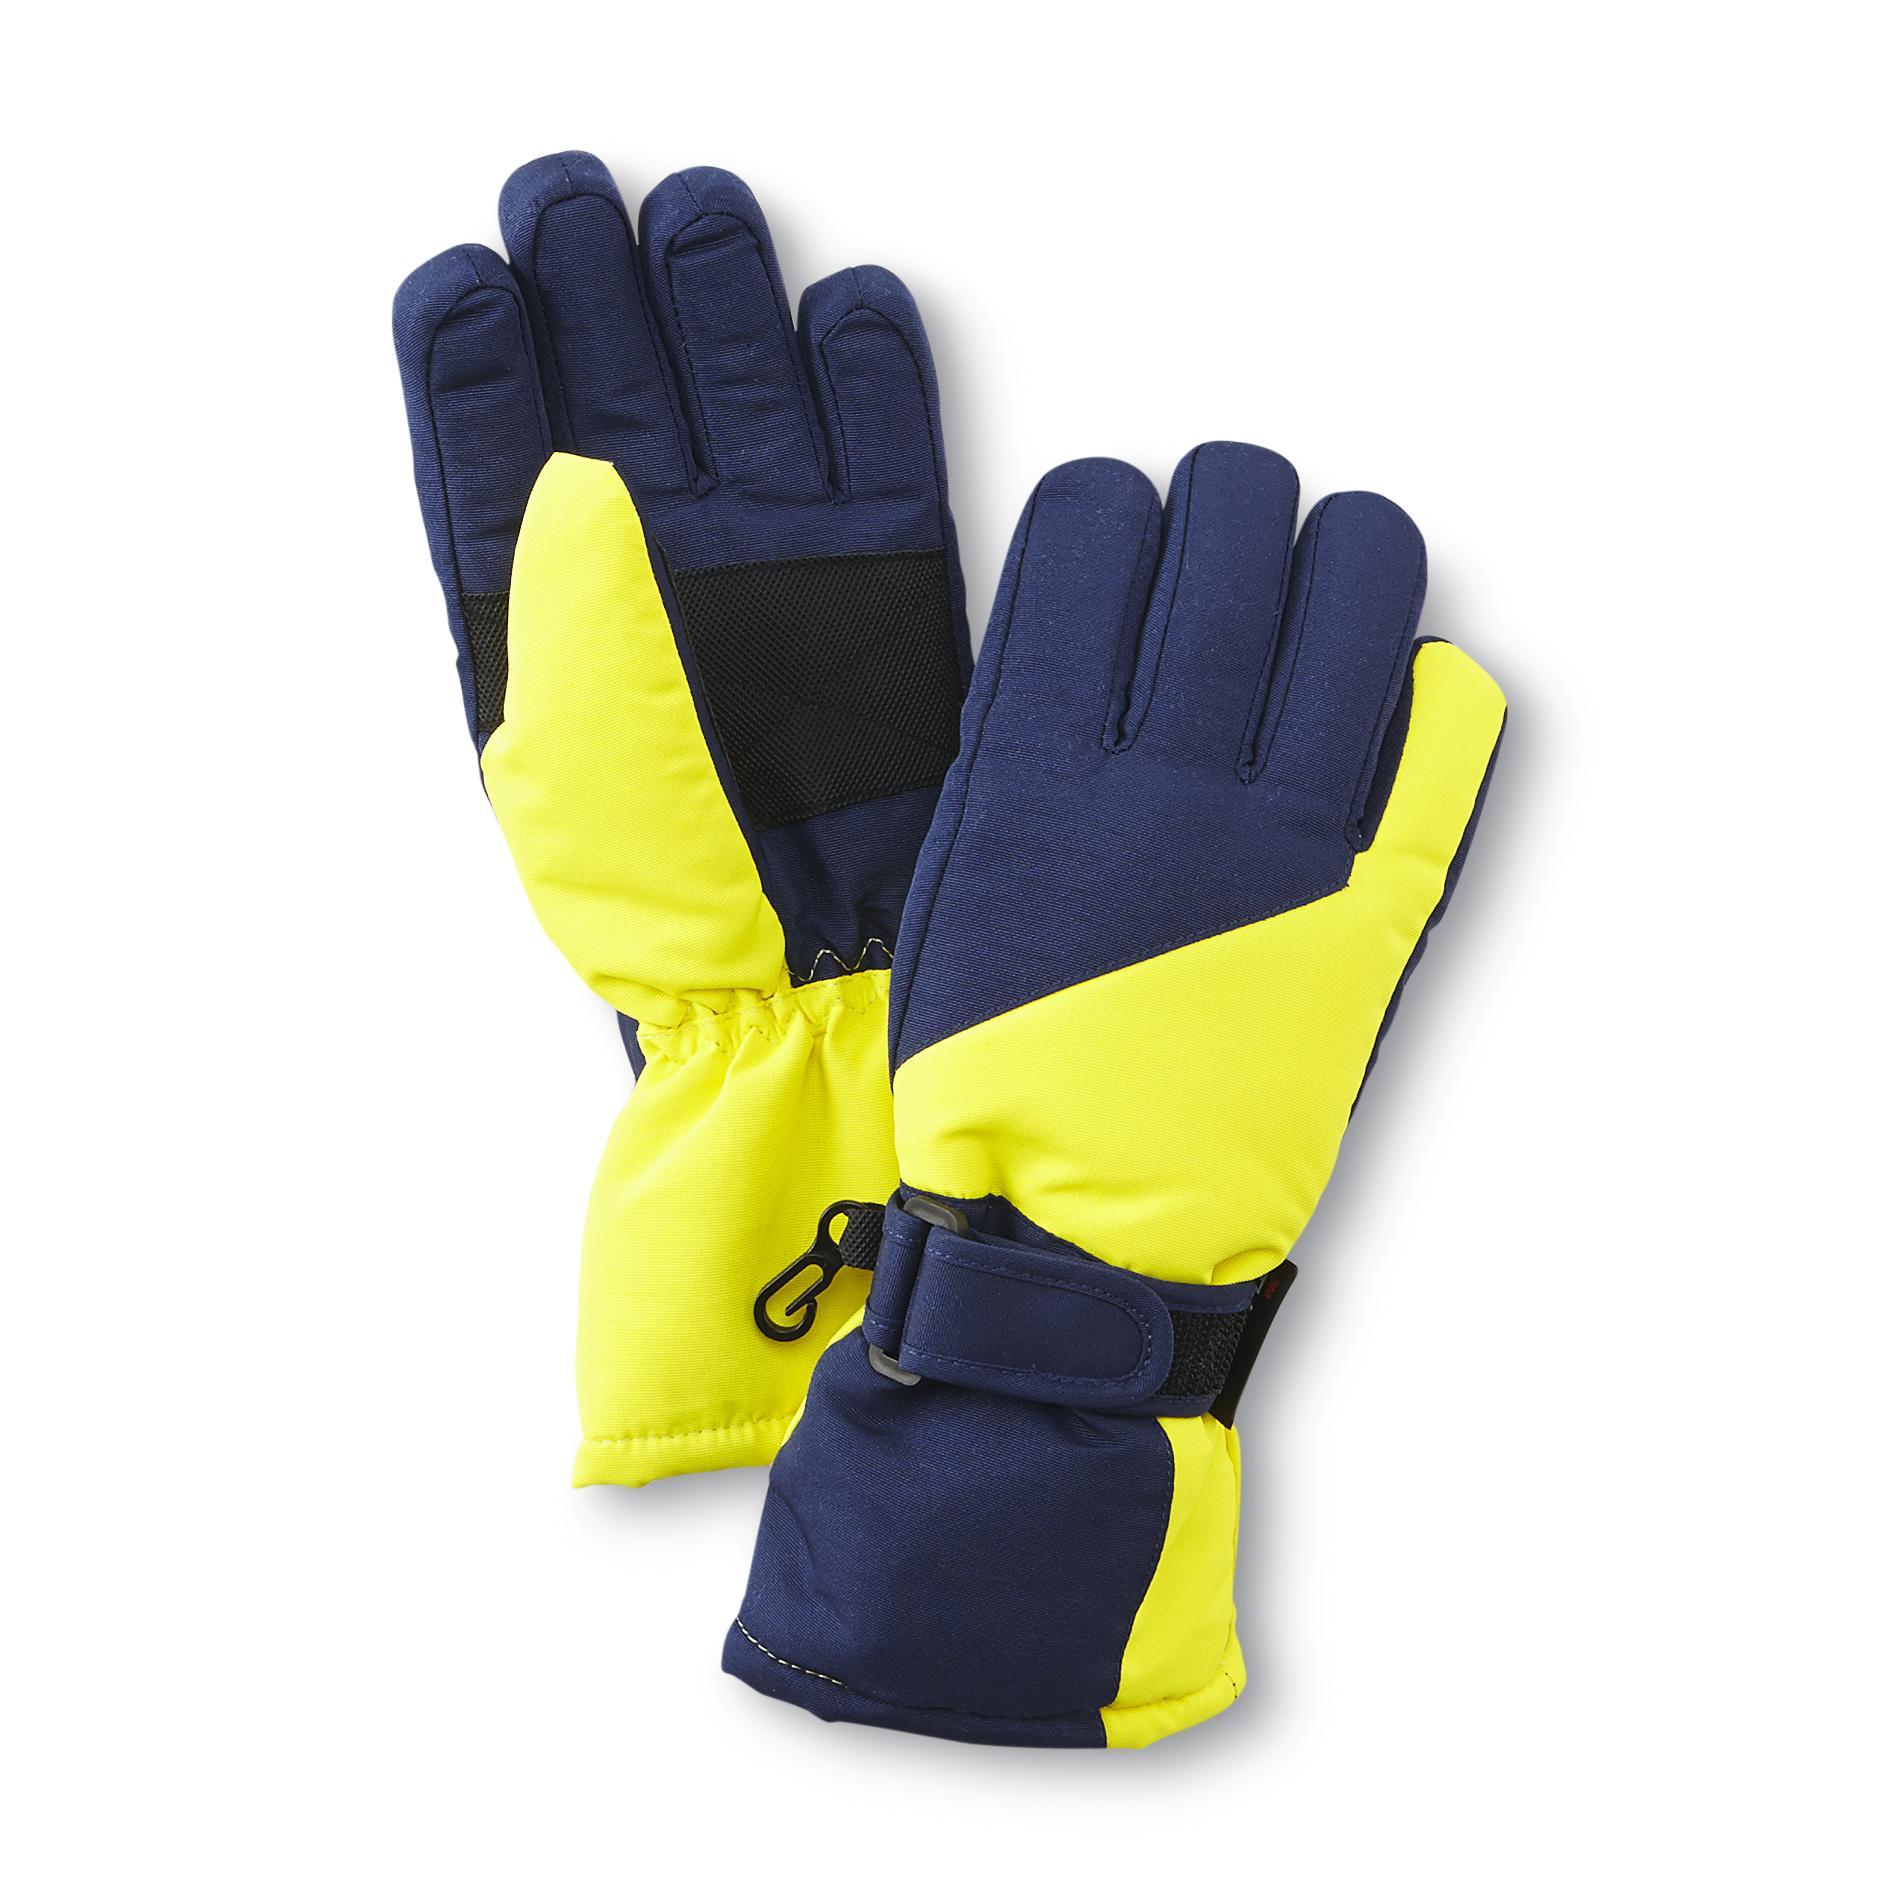 060e7322339 Athletech Boy s Ski Gloves - Colorblock